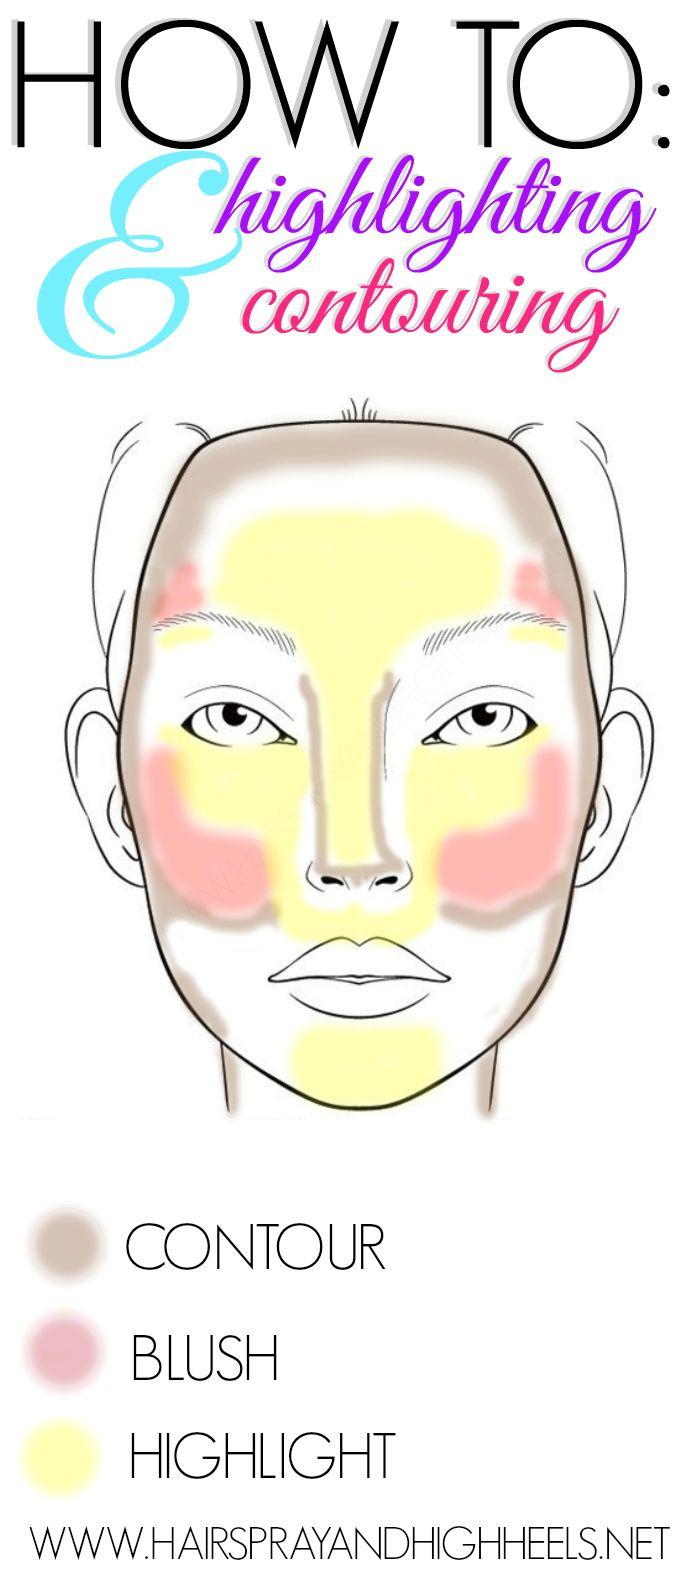 How To Highlight & Contour! #Beauty #Makeup #BeautyTips